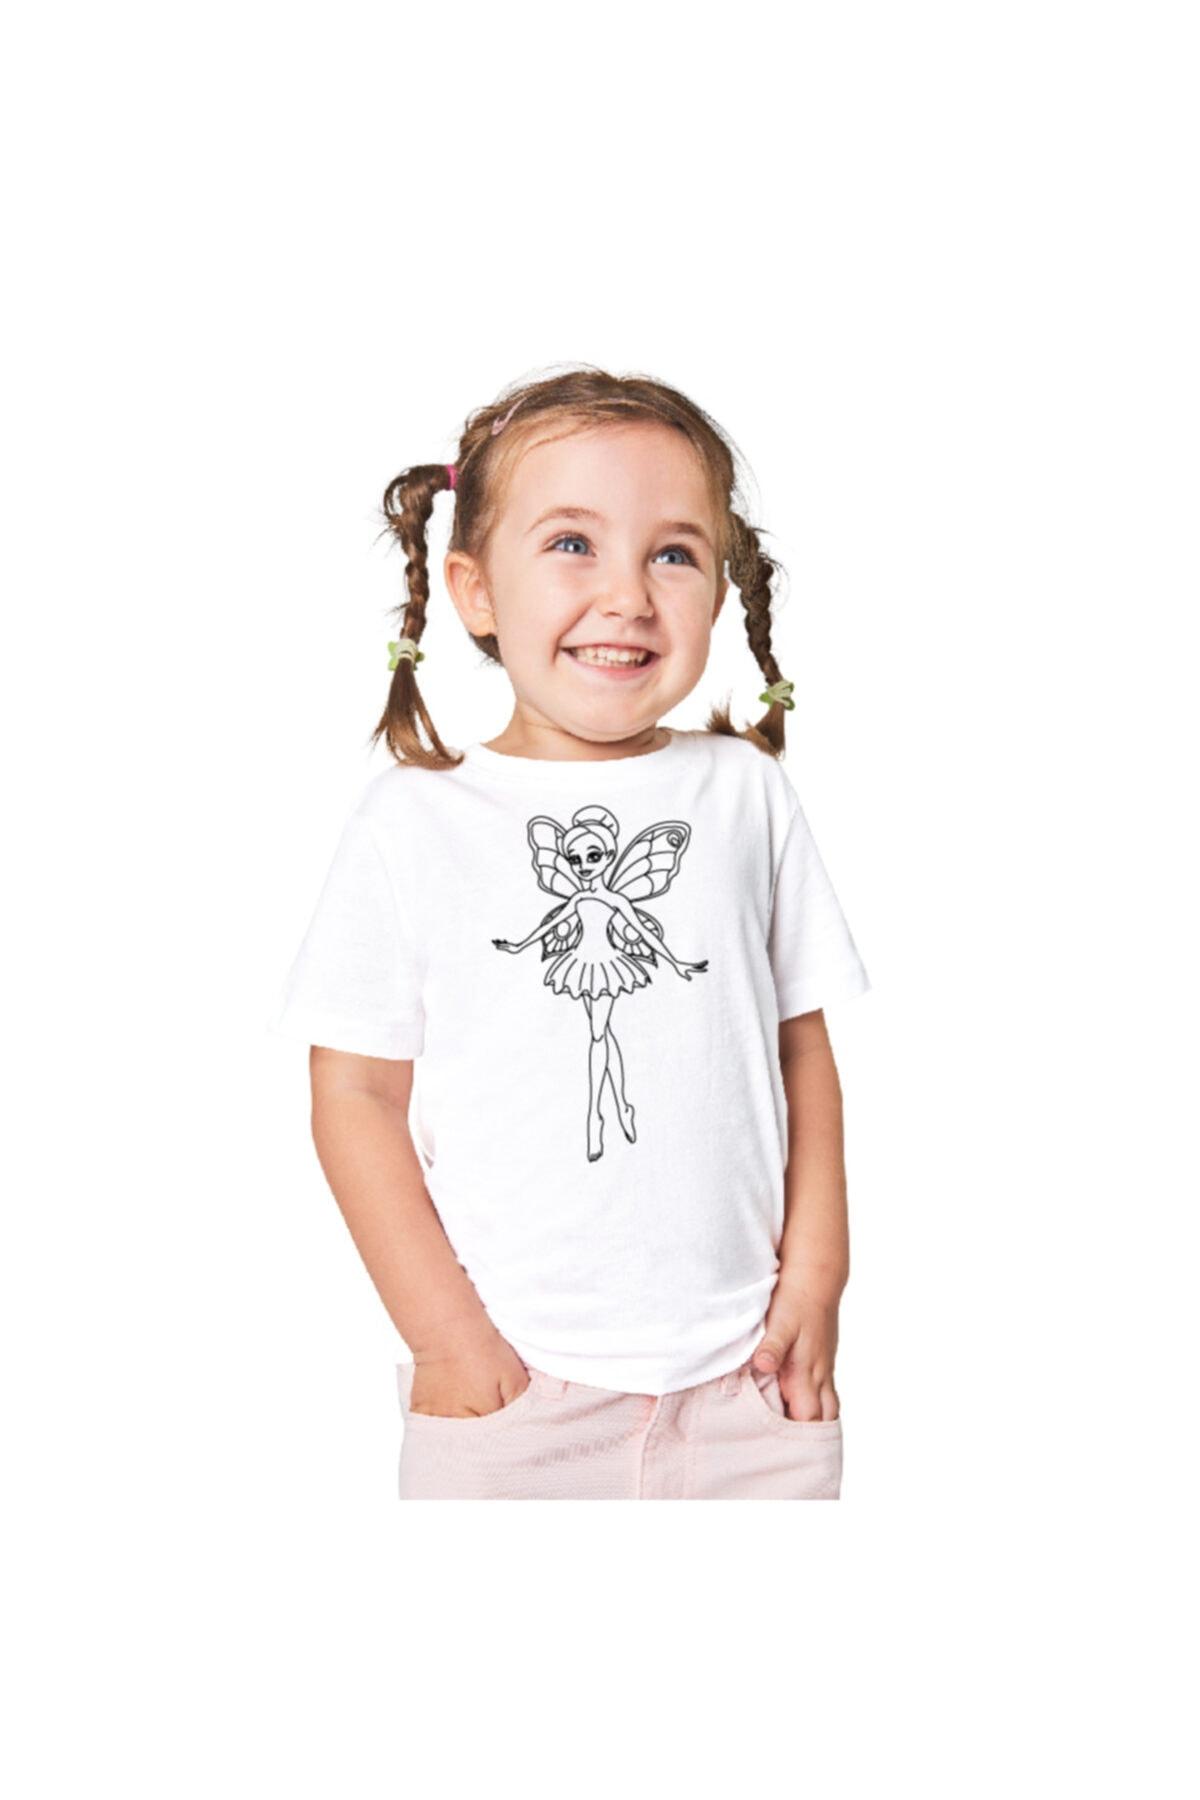 paint-wear Peri Boyama T-shirt 7-8 Yaş 2